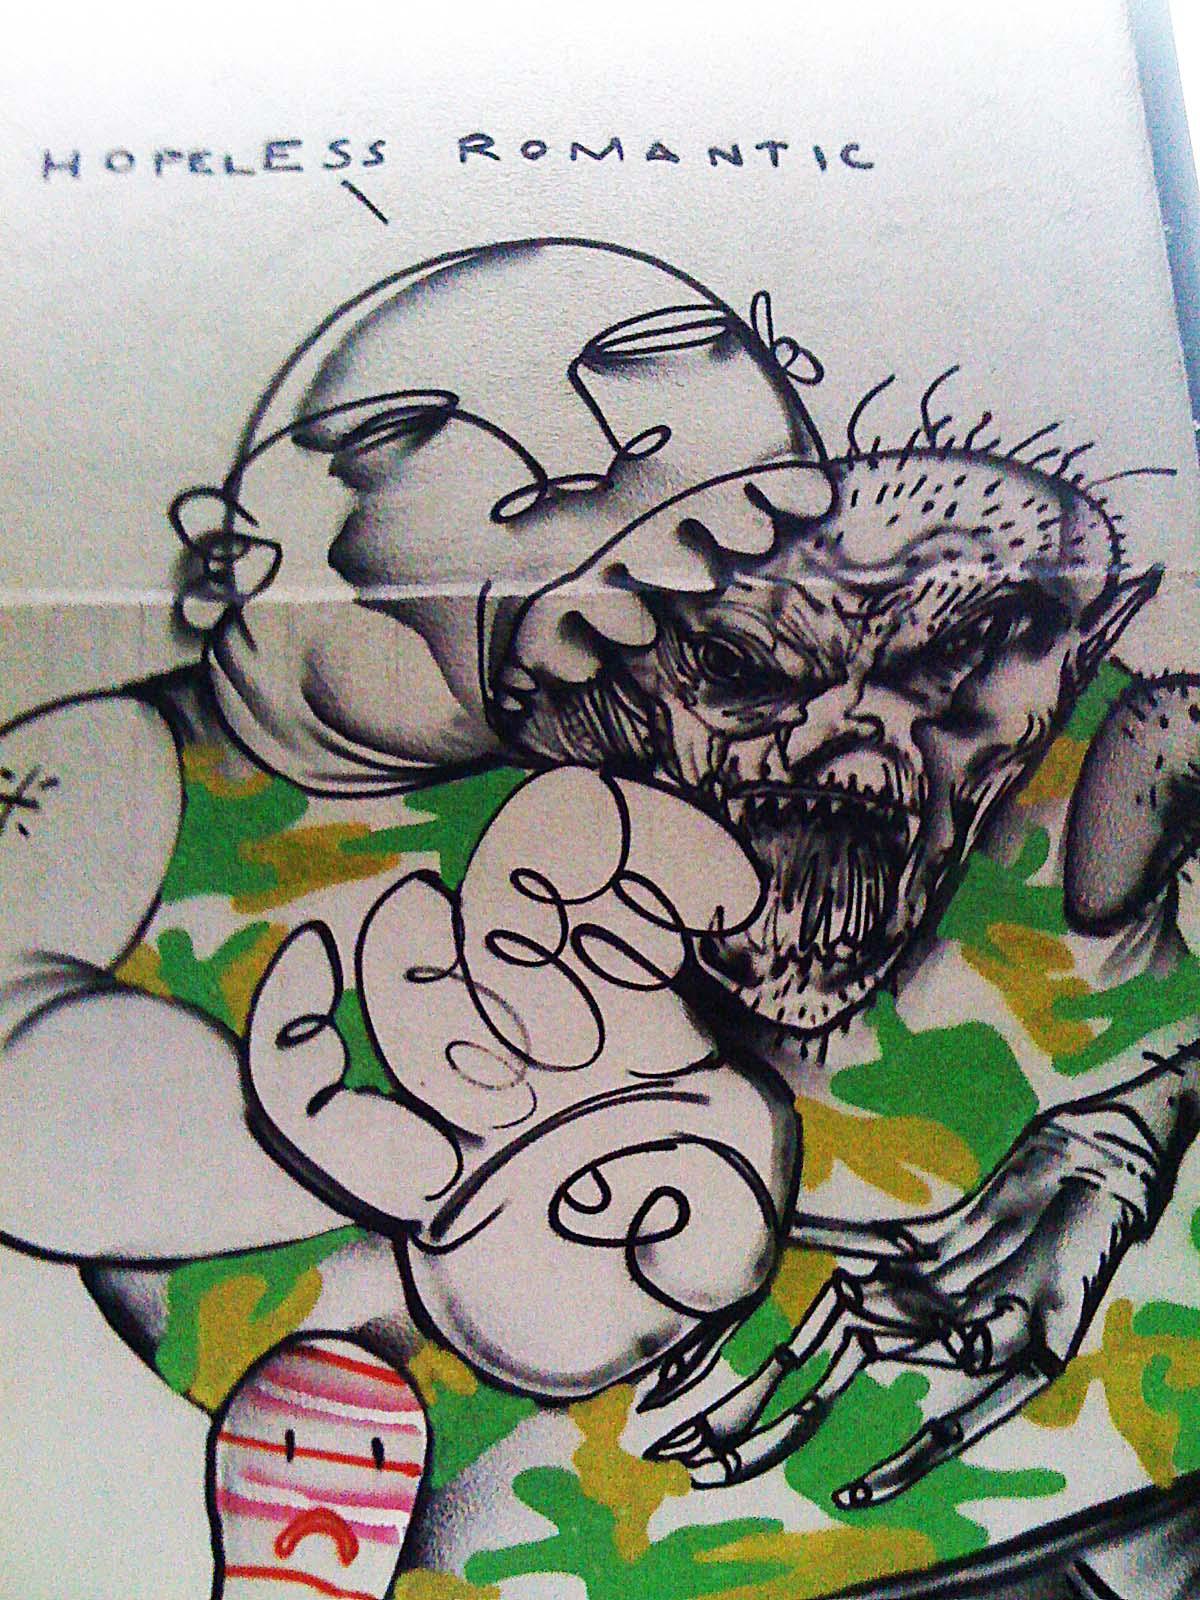 David-Choe-Grifters-05